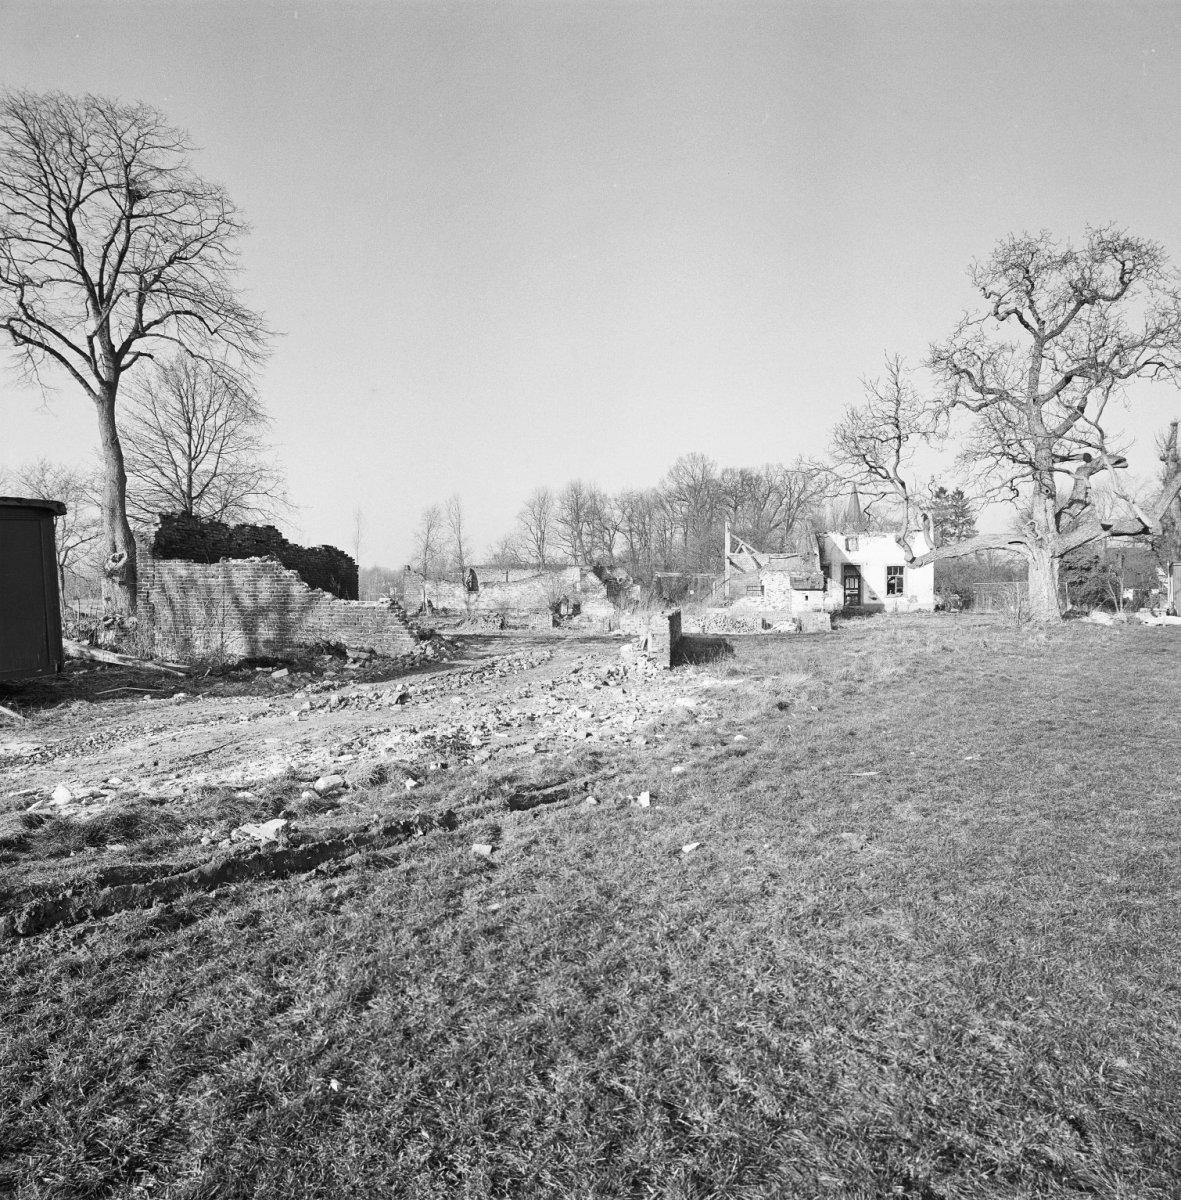 File exterieur huis in slechte staat bouwval met omgeving thorn 20002944 - Huis exterieur ...